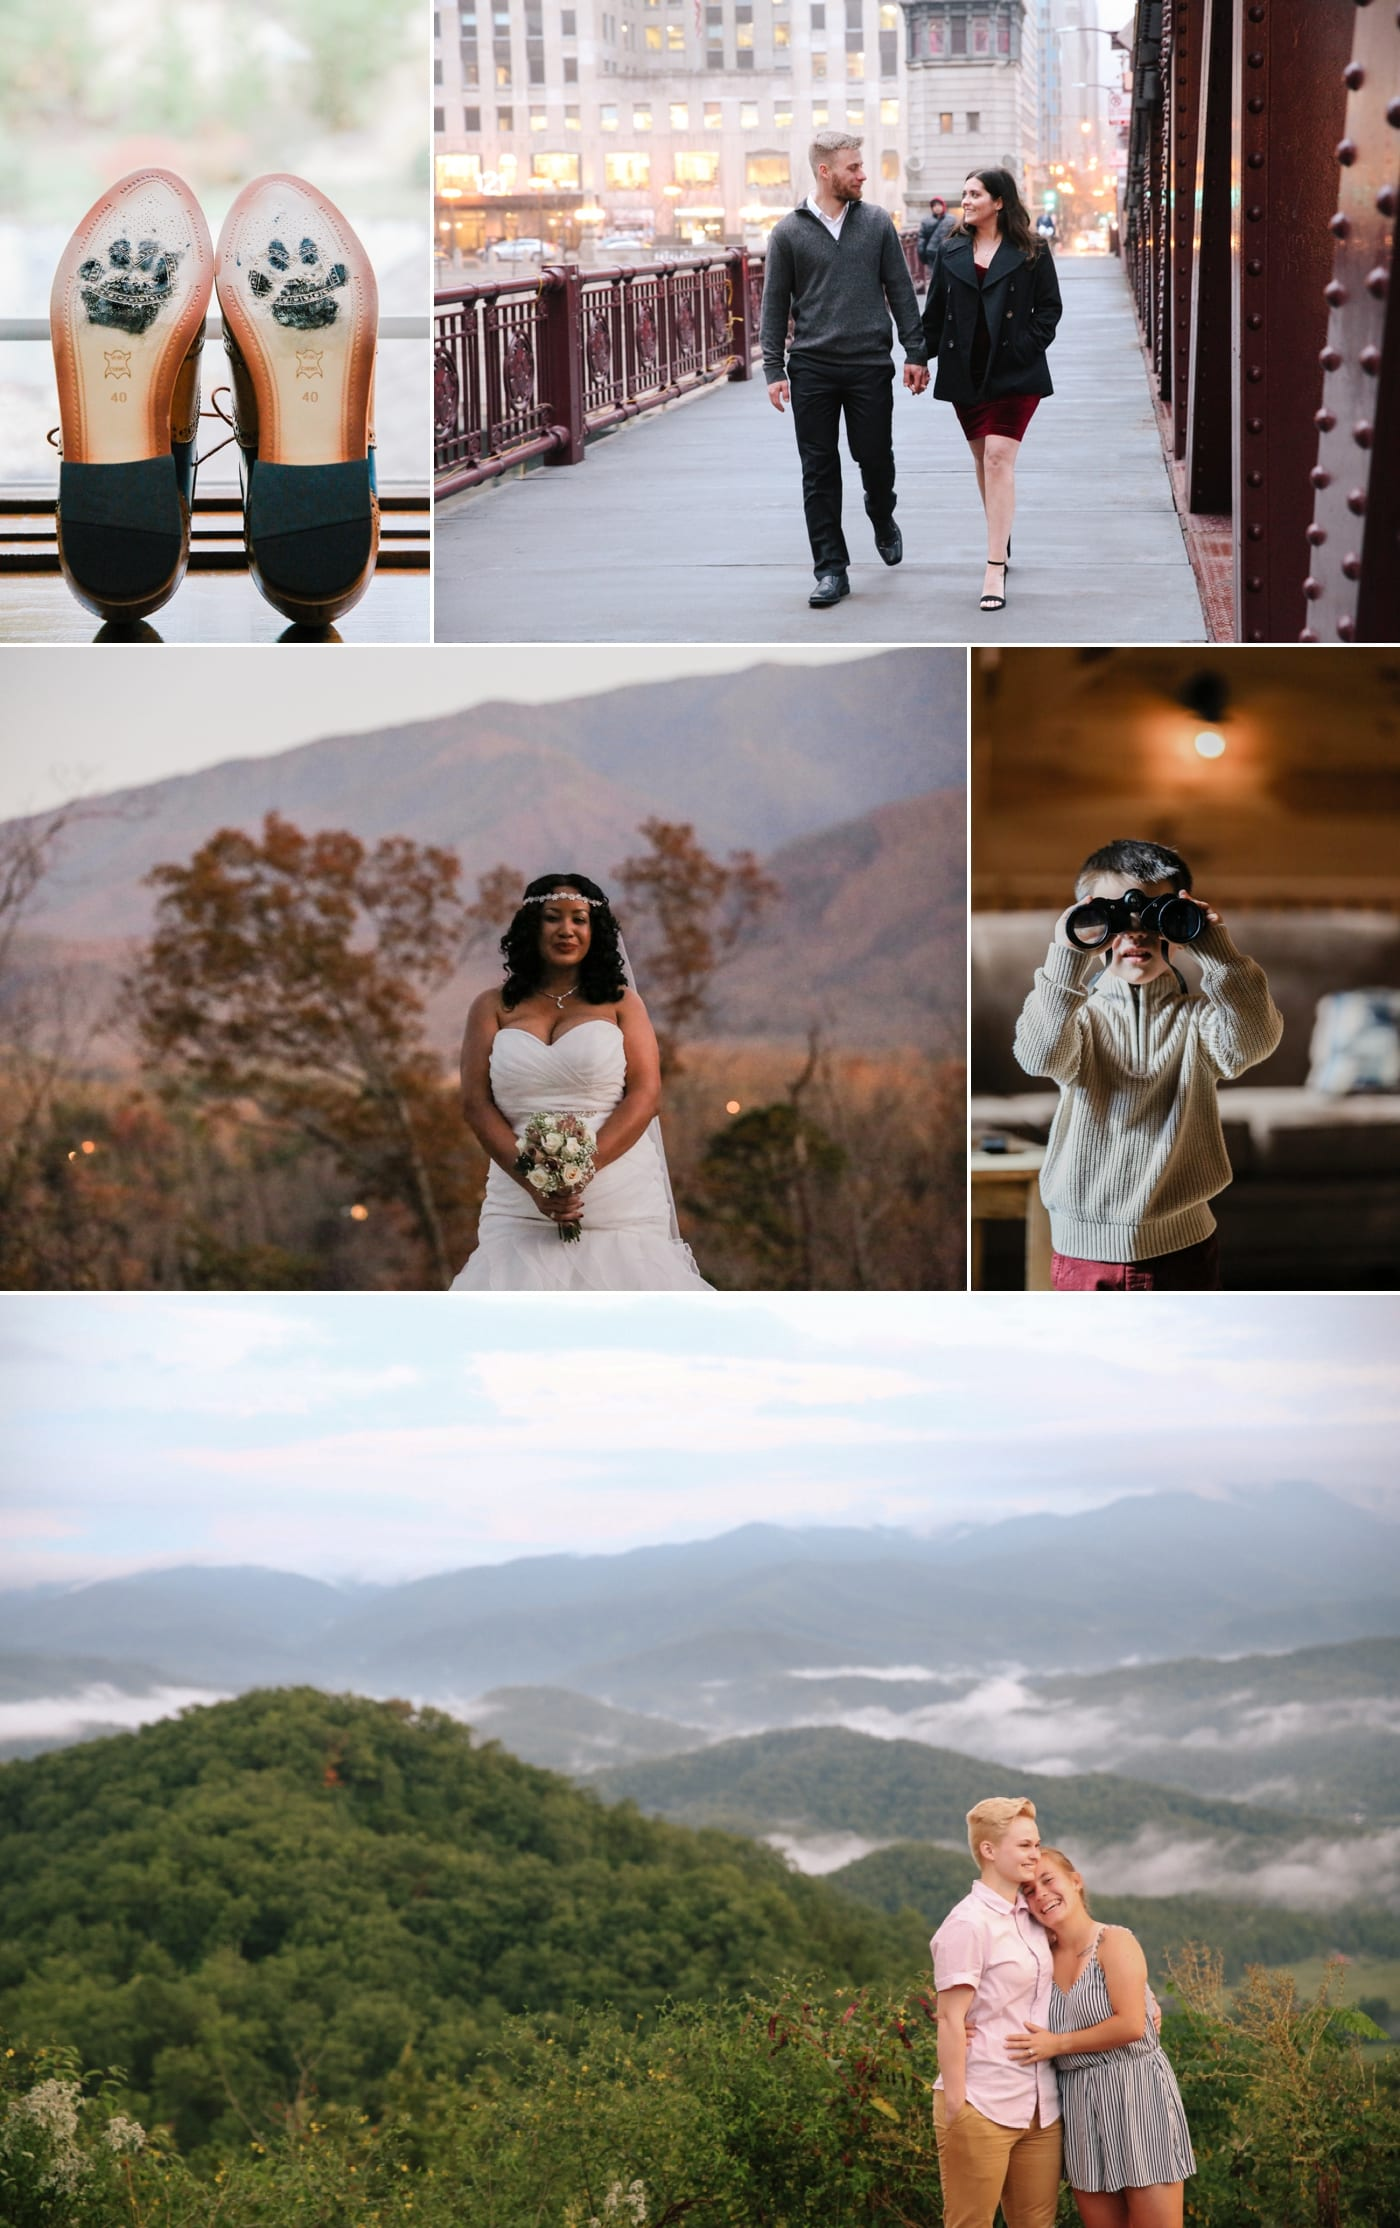 Smoky Mountain wedding ideas